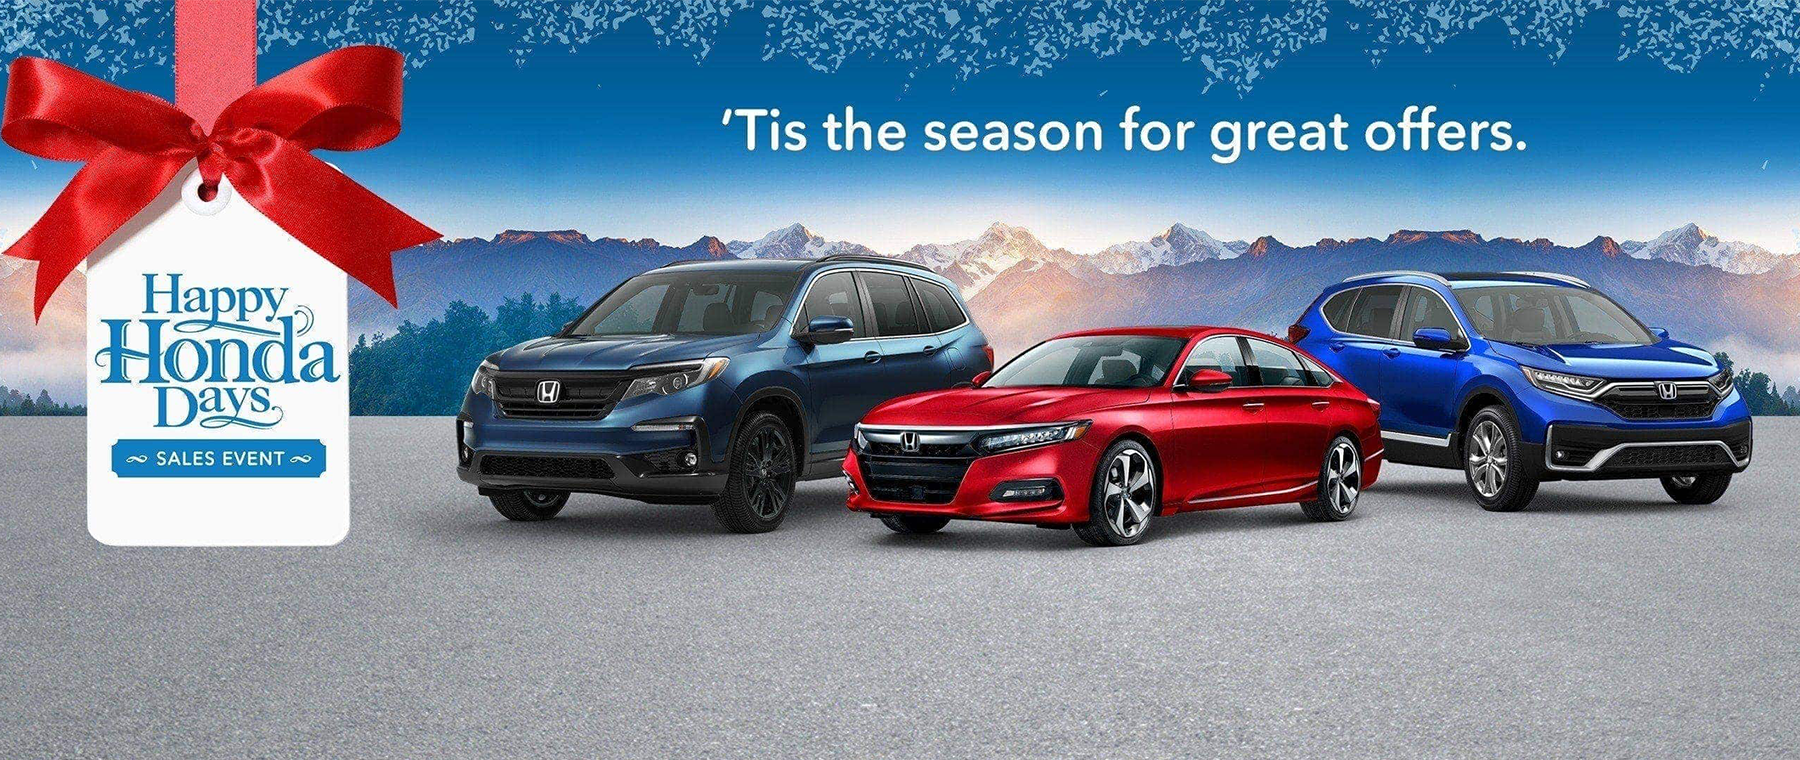 Happy Honda Days 2020